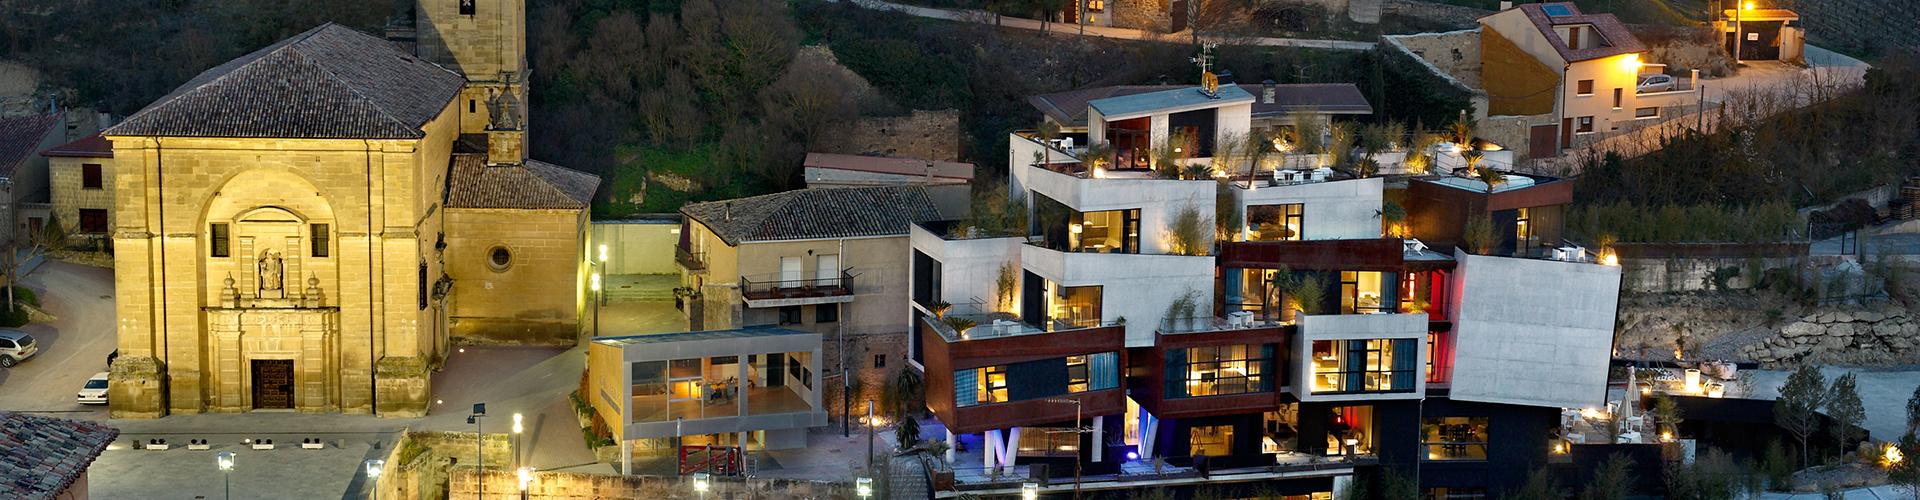 HOTEL VIURA (2)